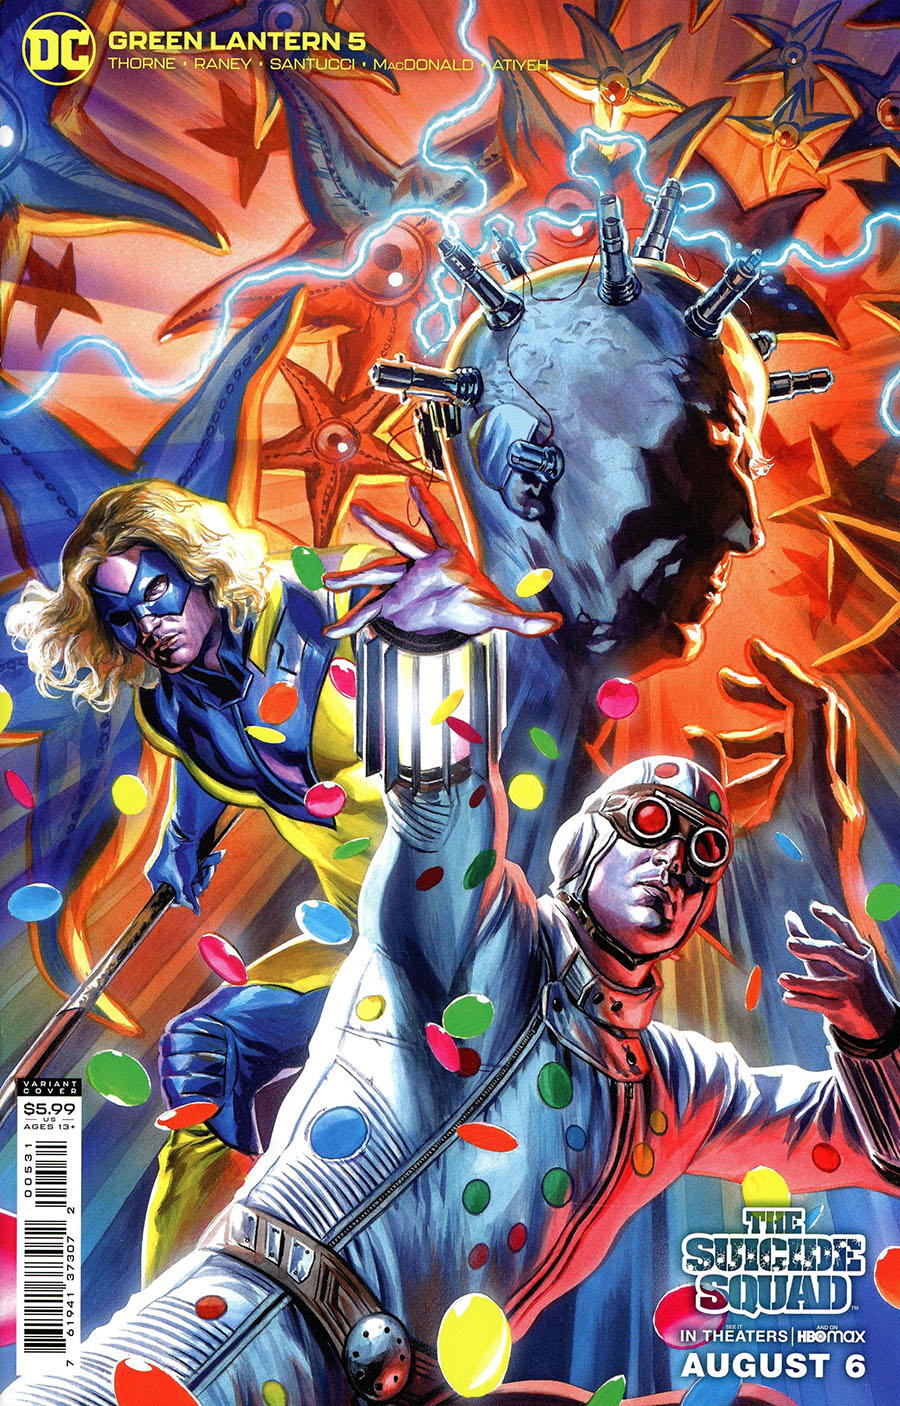 Green Lantern Vol 7 #5 Cover C Variant Felipe Massafera The Suicide Squad Movie Card Stock Cover